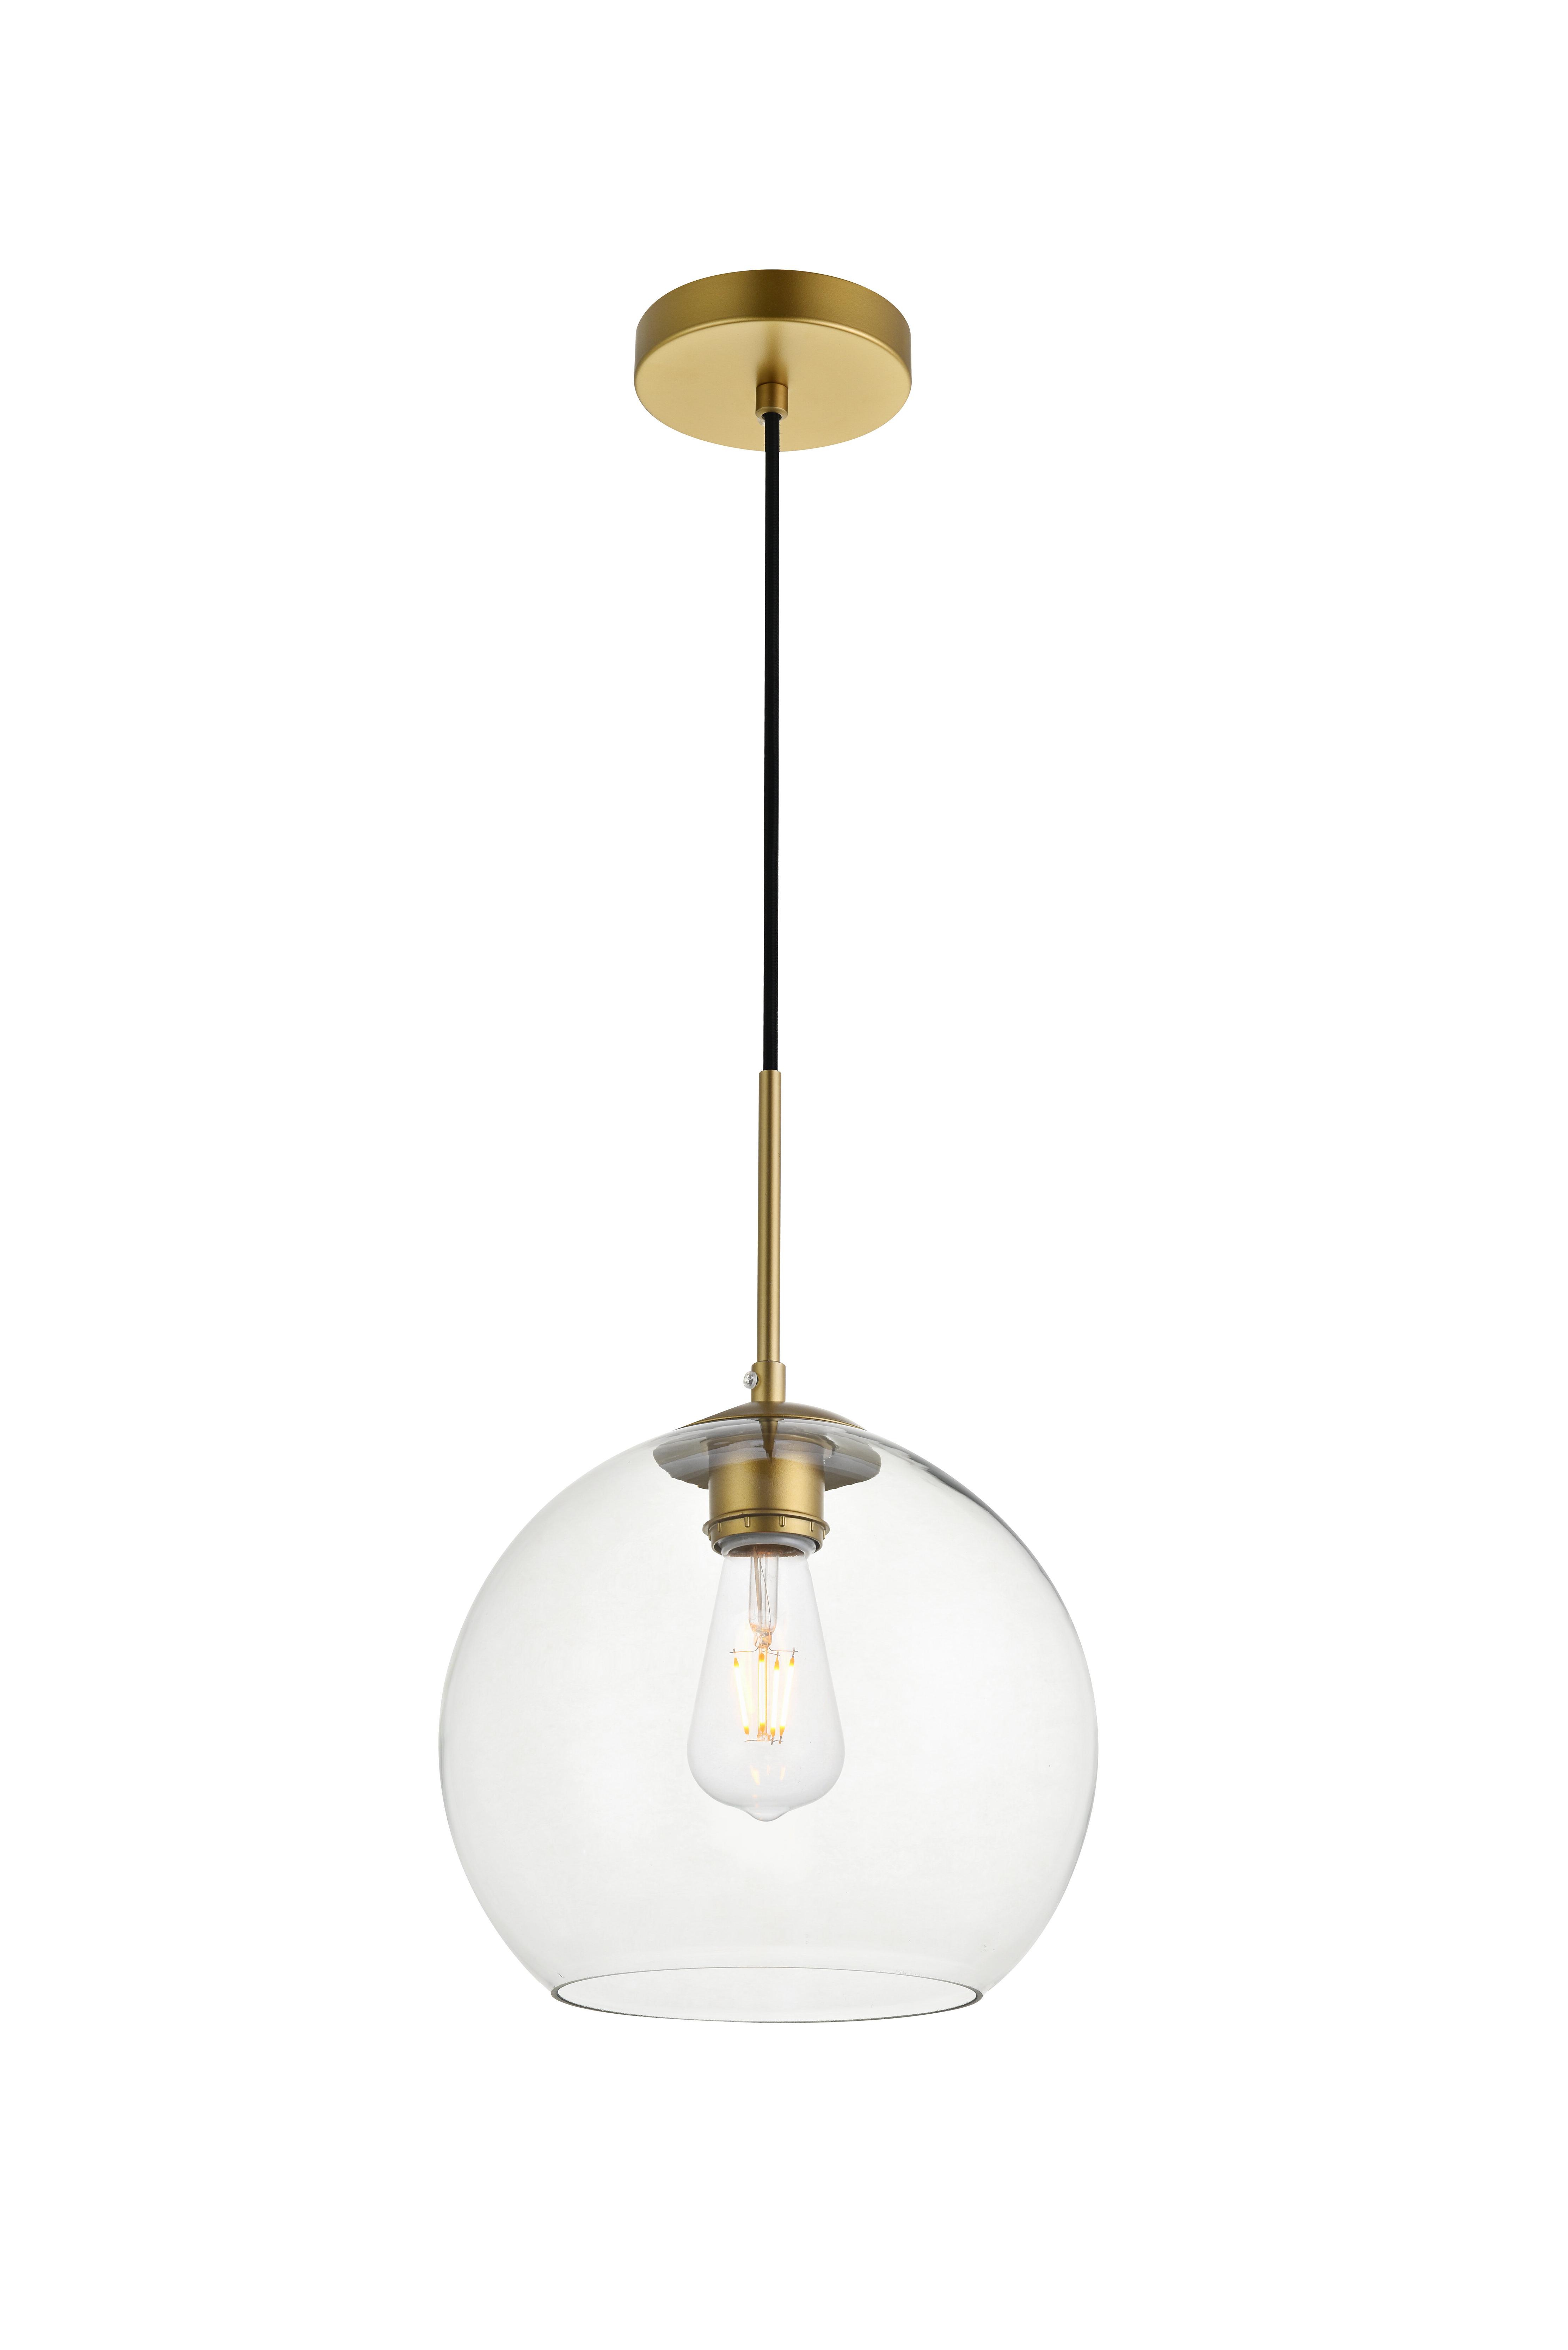 Well Liked Mercury Row Yearwood 1 Light Single Globe Pendant In Bautista 1 Light Single Globe Pendants (View 17 of 25)